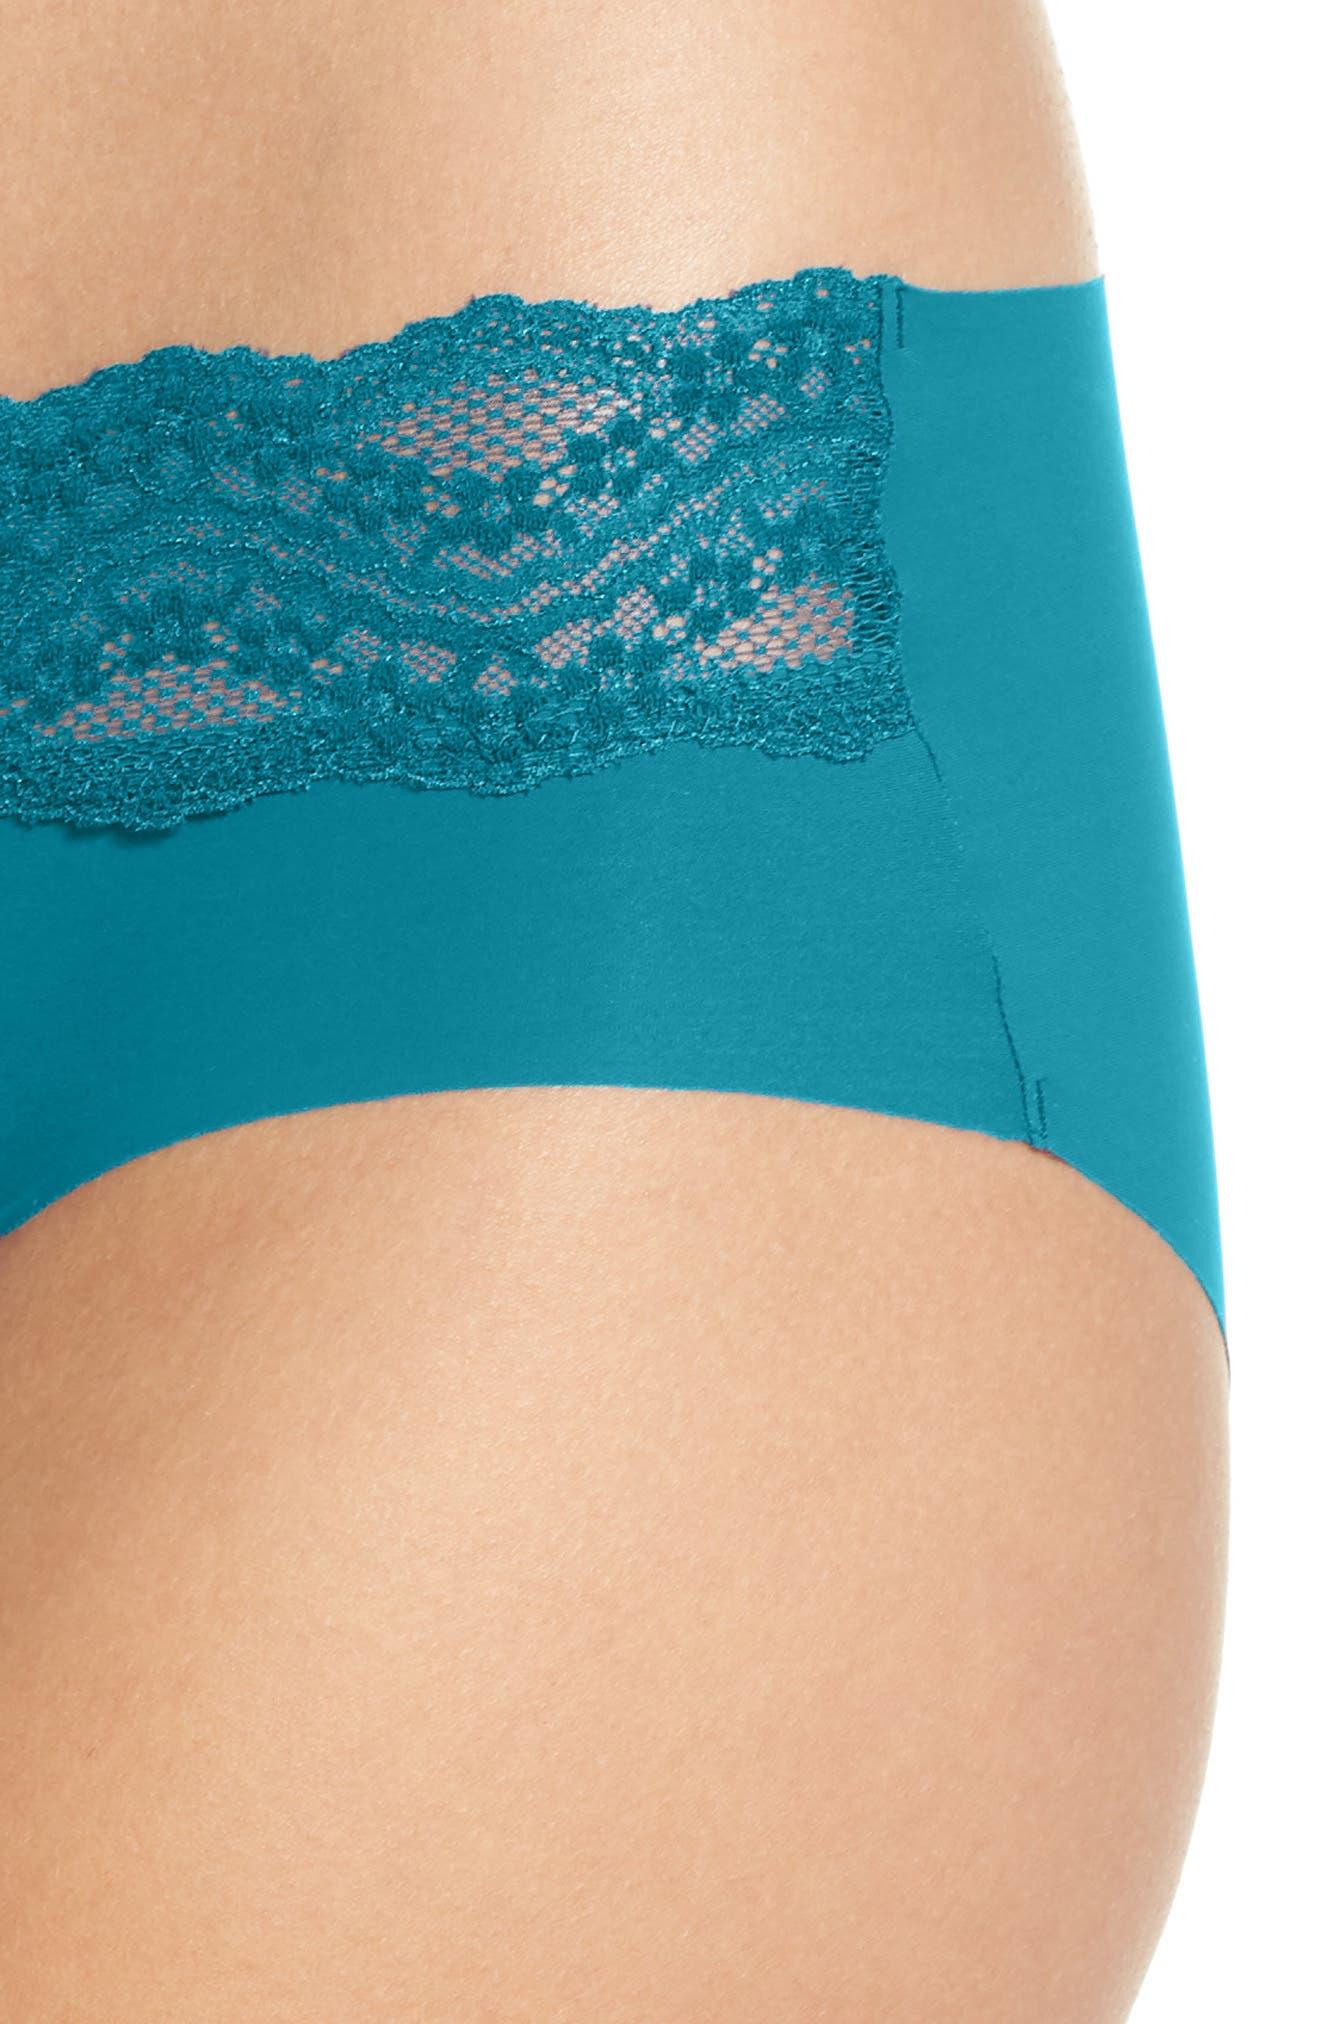 b.bare Hipster Panties,                             Alternate thumbnail 4, color,                             447